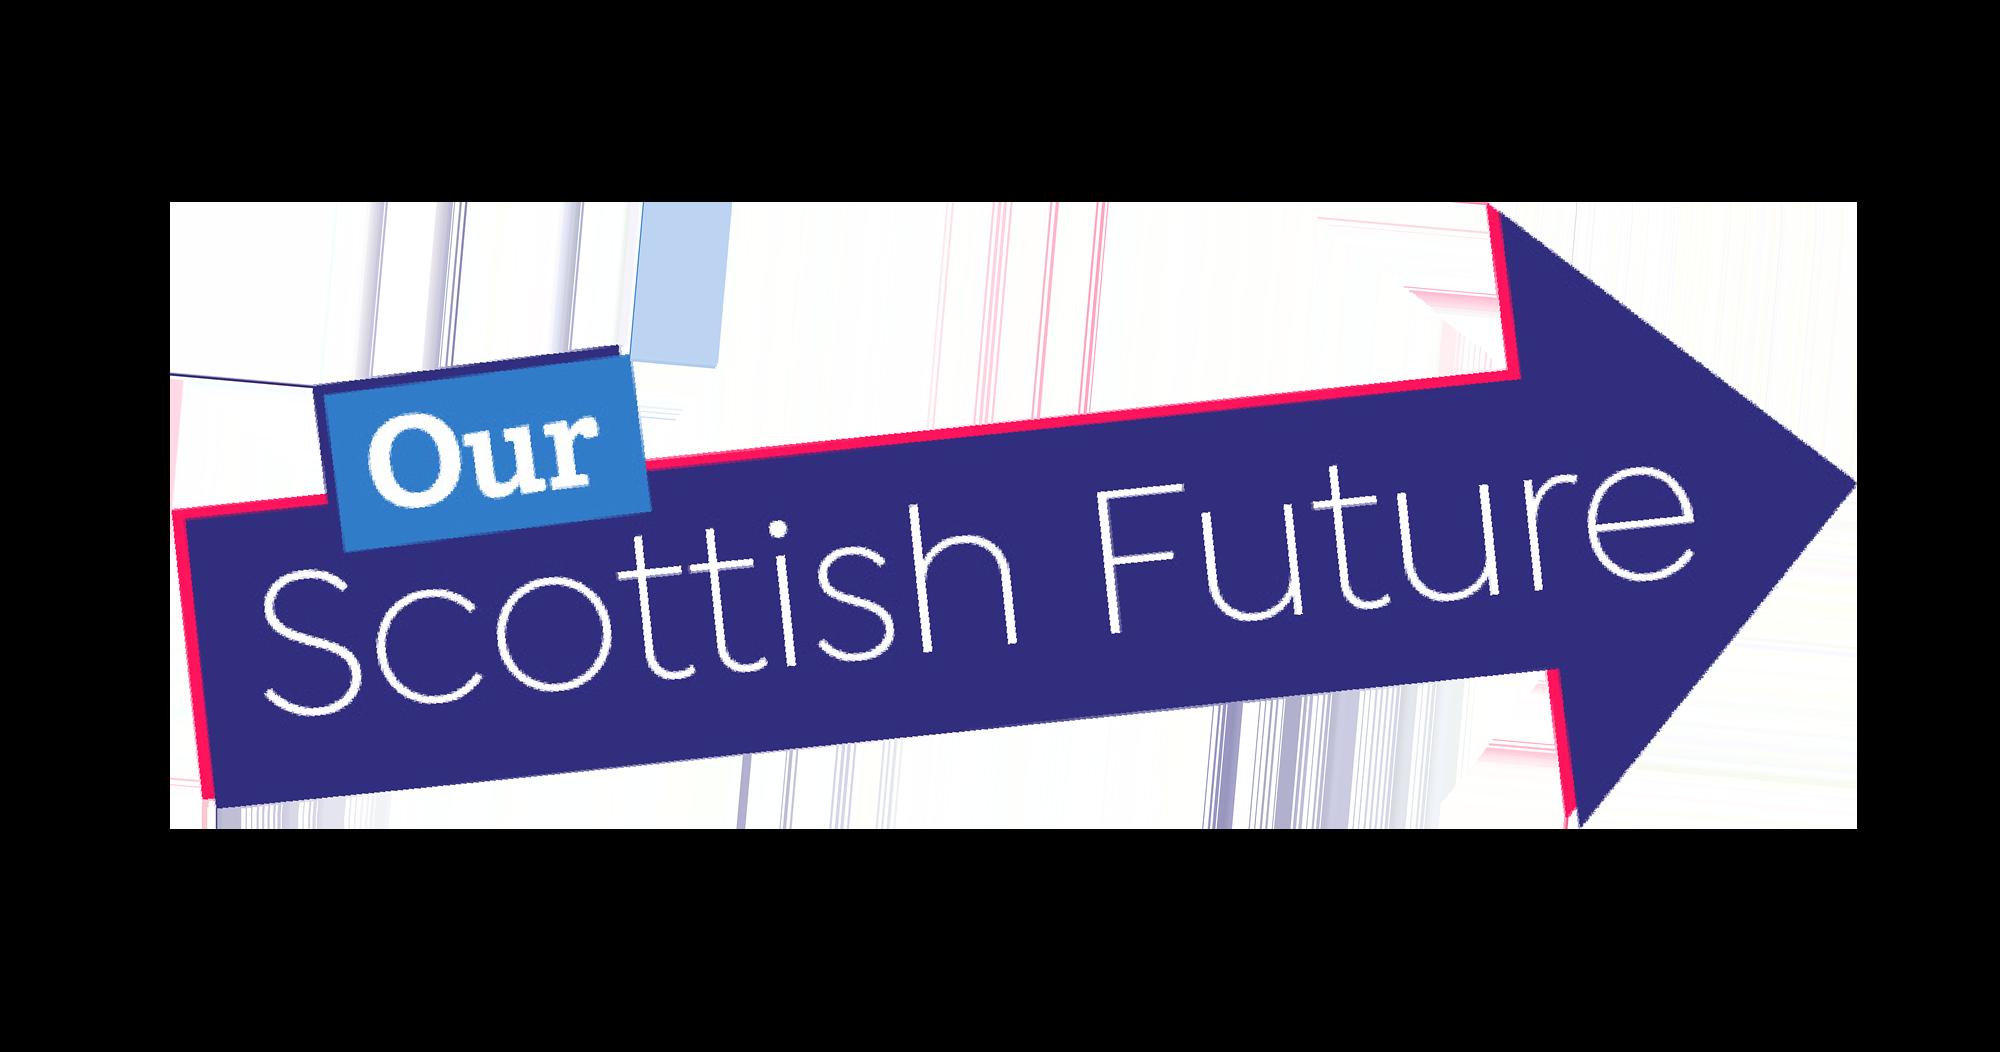 Our Scottish Future